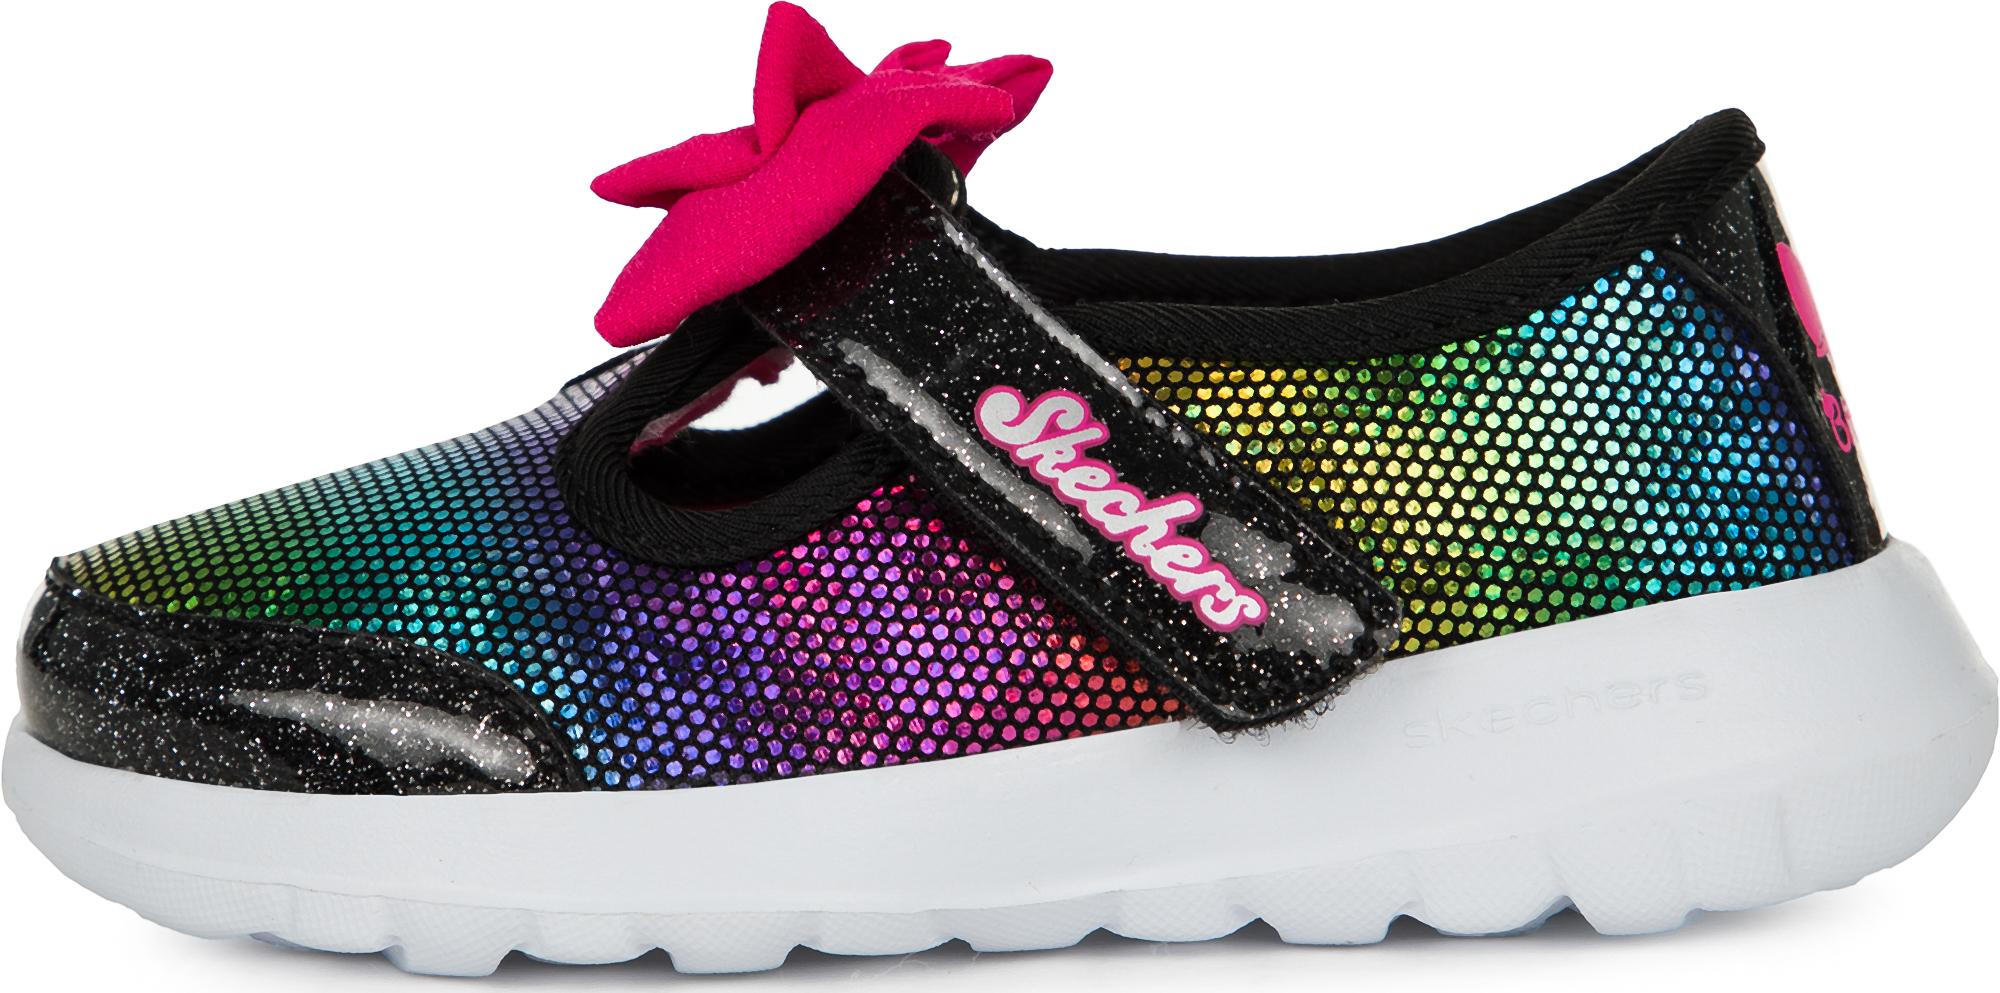 Skechers Кроссовки для девочек Skechers Go Walk Joy-Lil Darling, размер 28,5 цена и фото